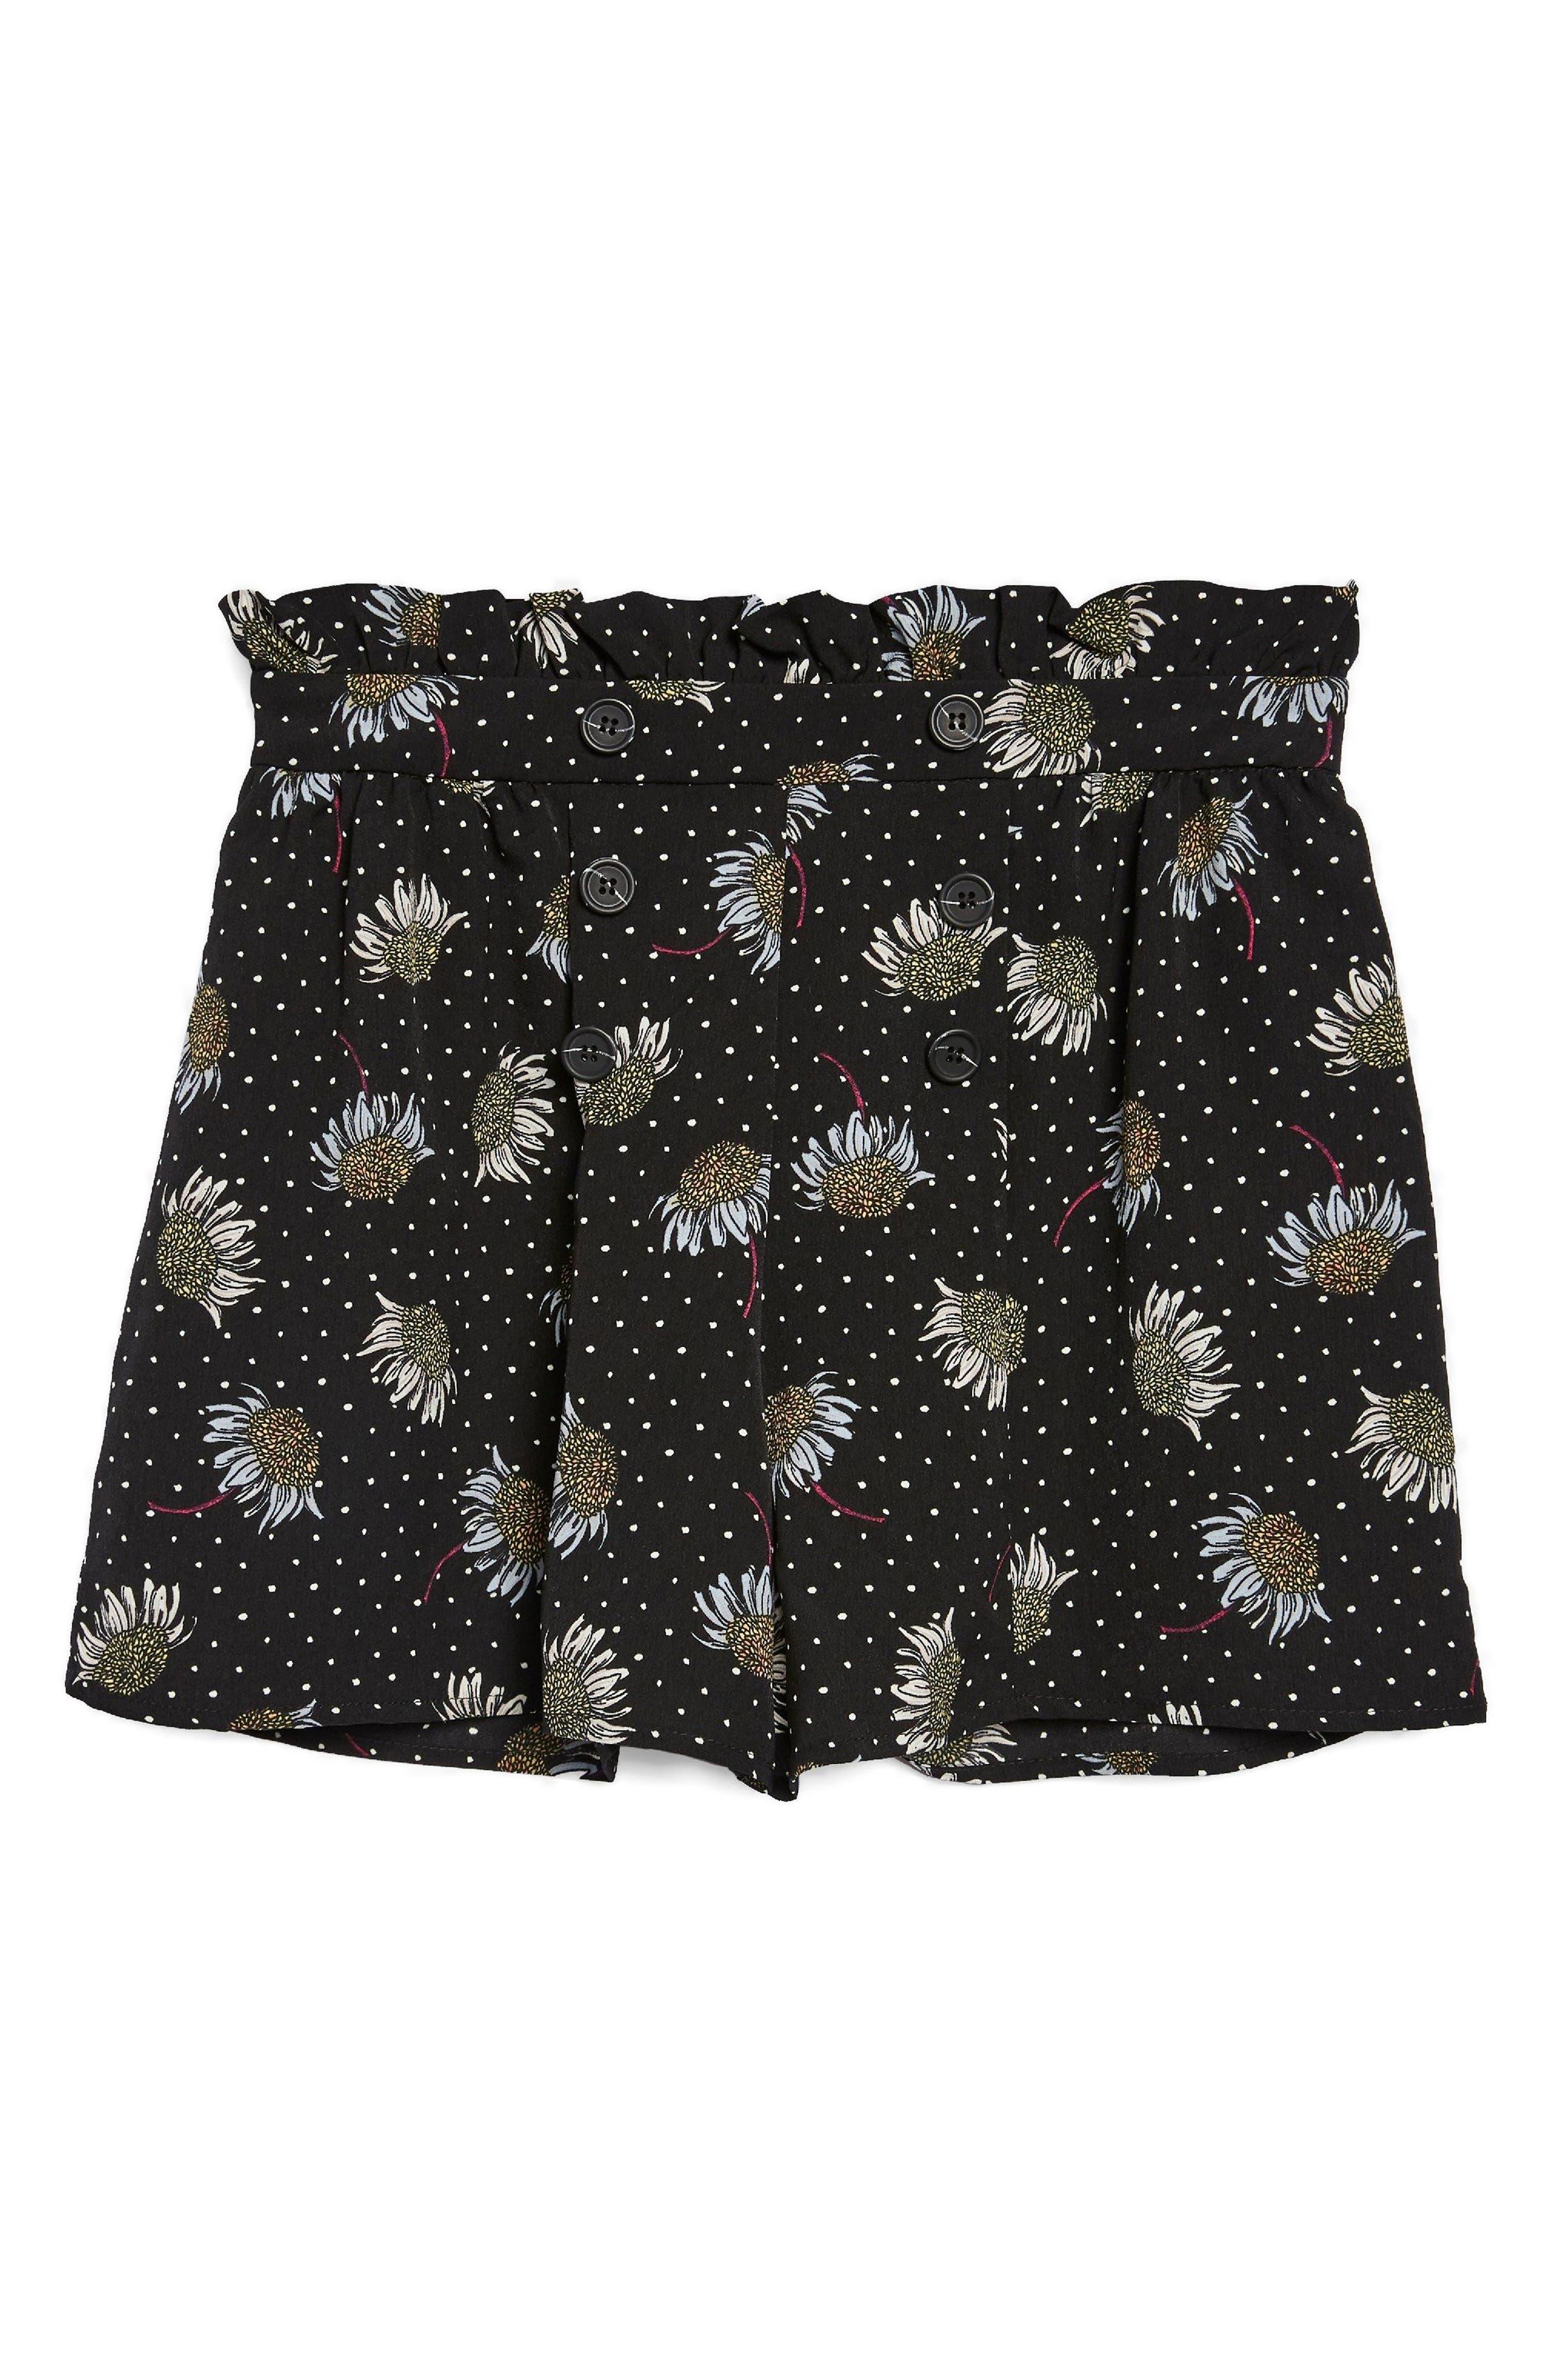 Daisy Print Frill Waist Shorts,                             Alternate thumbnail 3, color,                             001